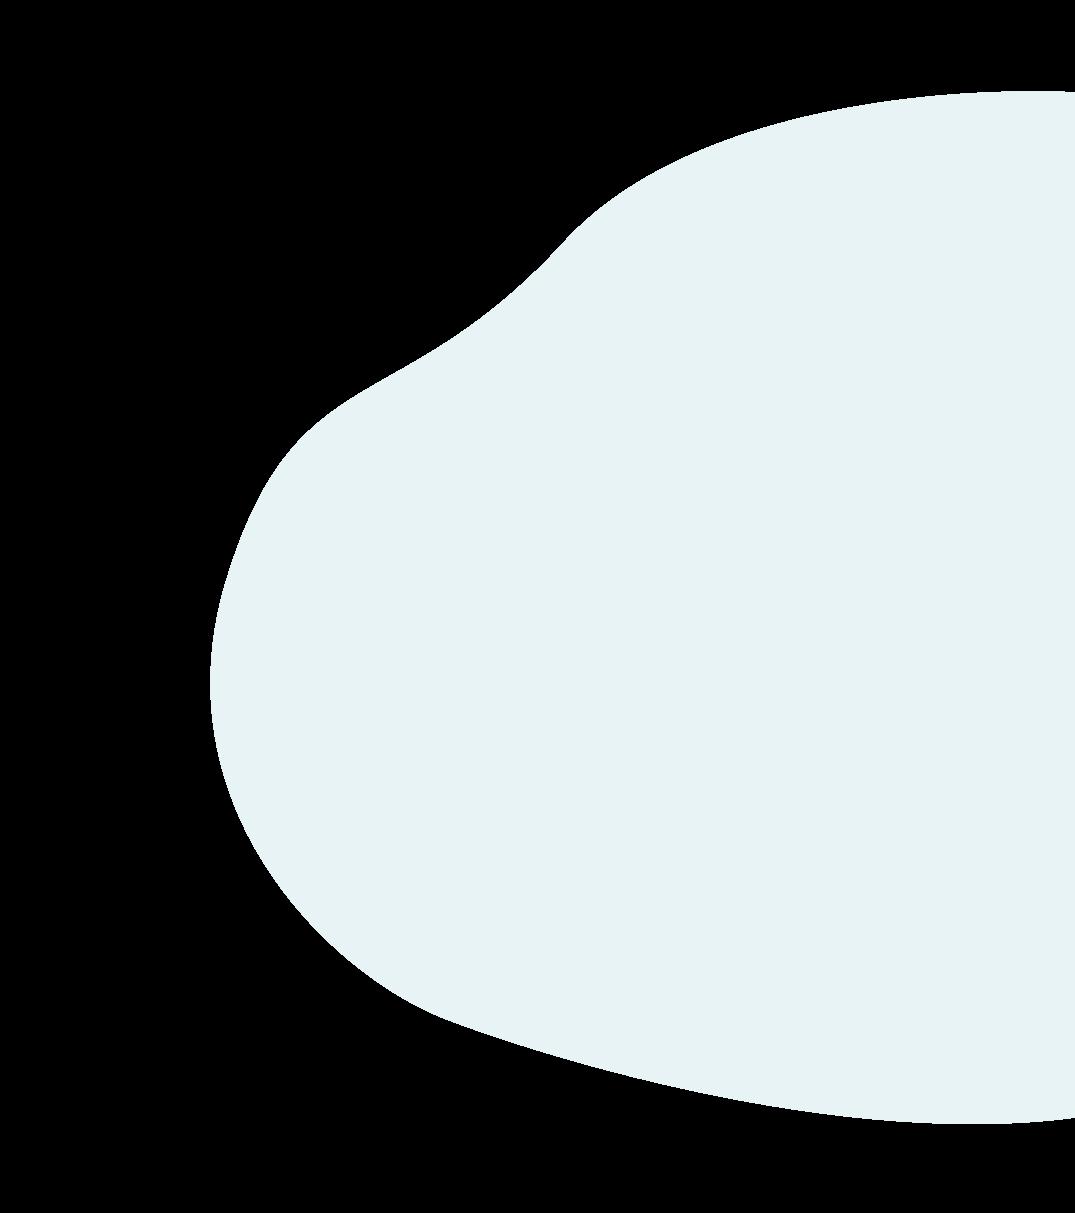 Light blue blob